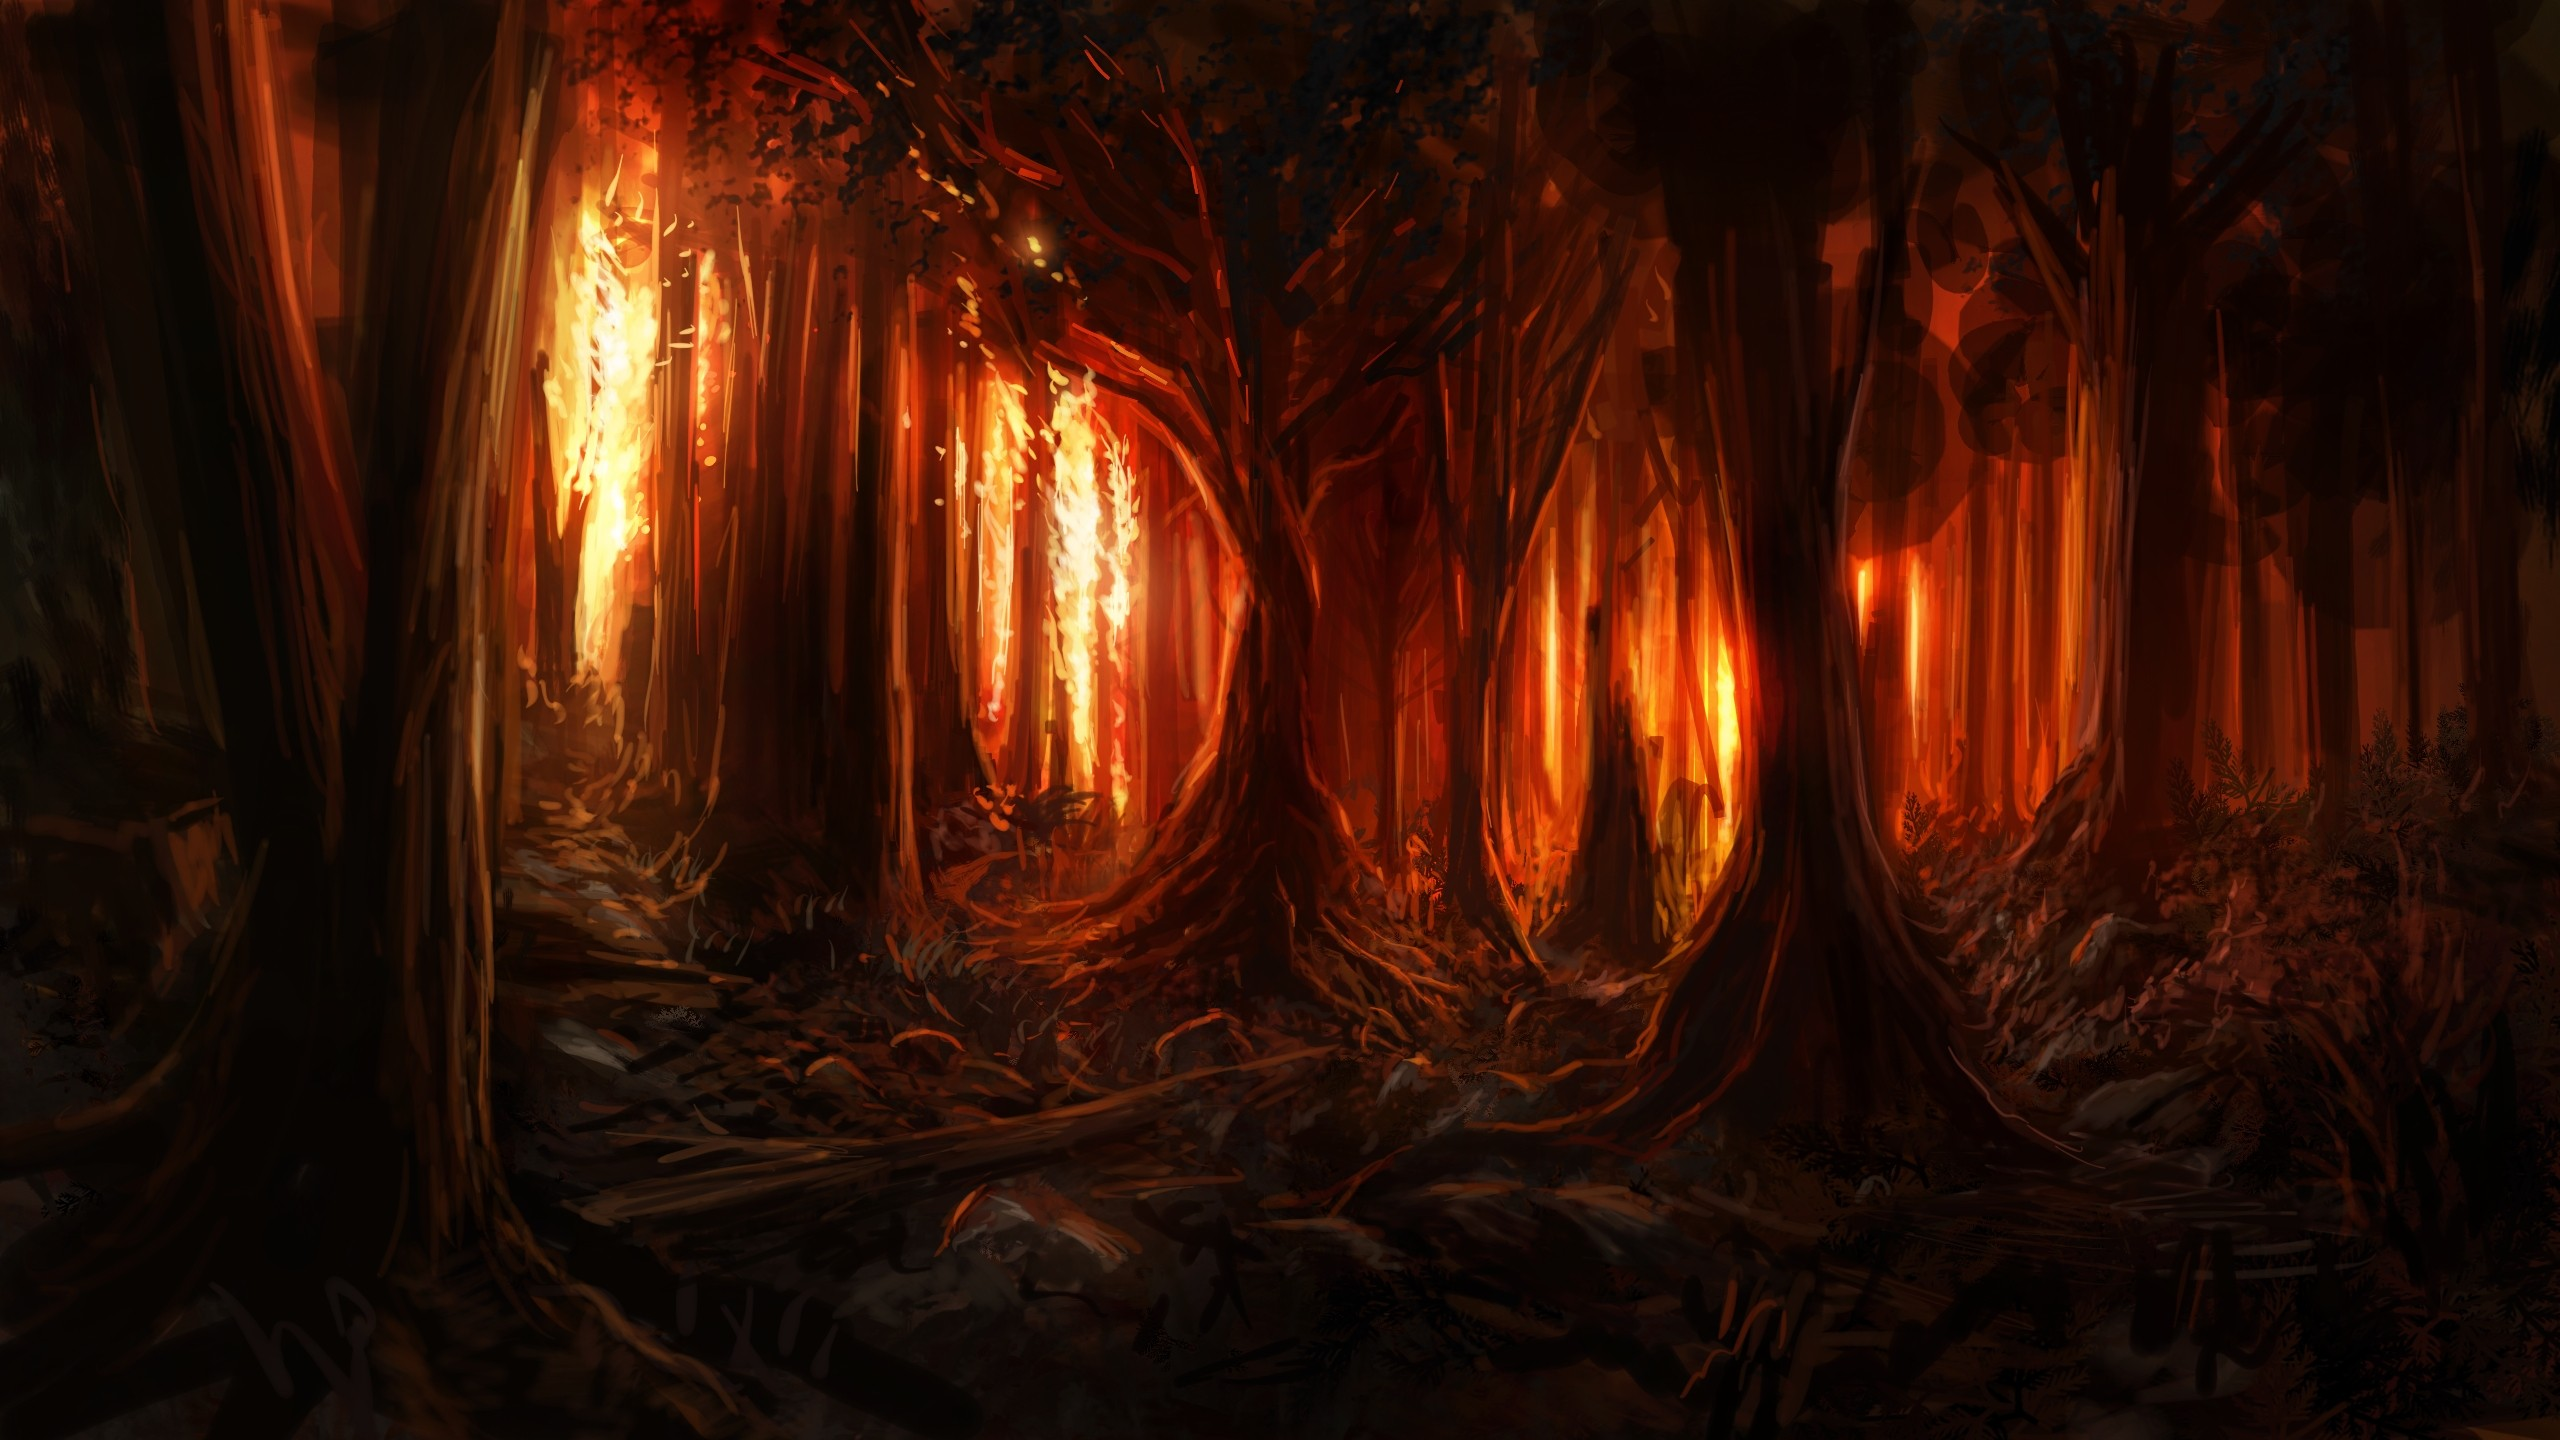 Digital art nature trees branch fire wood wallpaper 175584 download wallpaper voltagebd Gallery